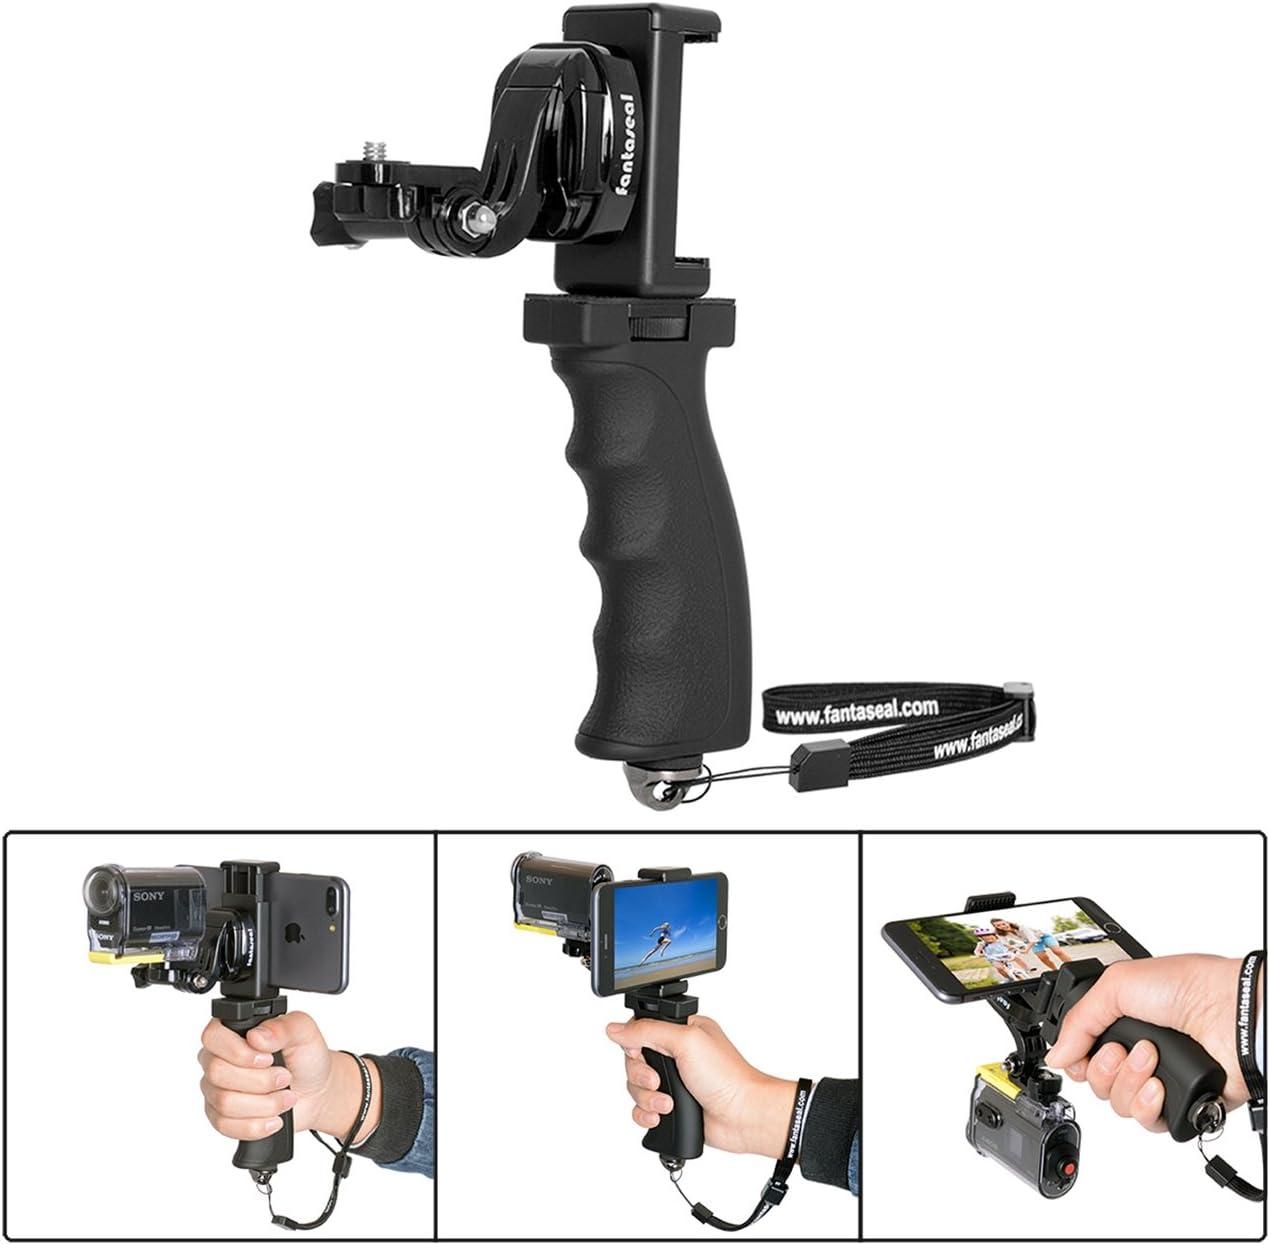 Vertical Shoe Mount Stabilizer Handle FinePix S4050 Pro Video Stabilizing Handle Grip for FujiFilm FinePix S4000